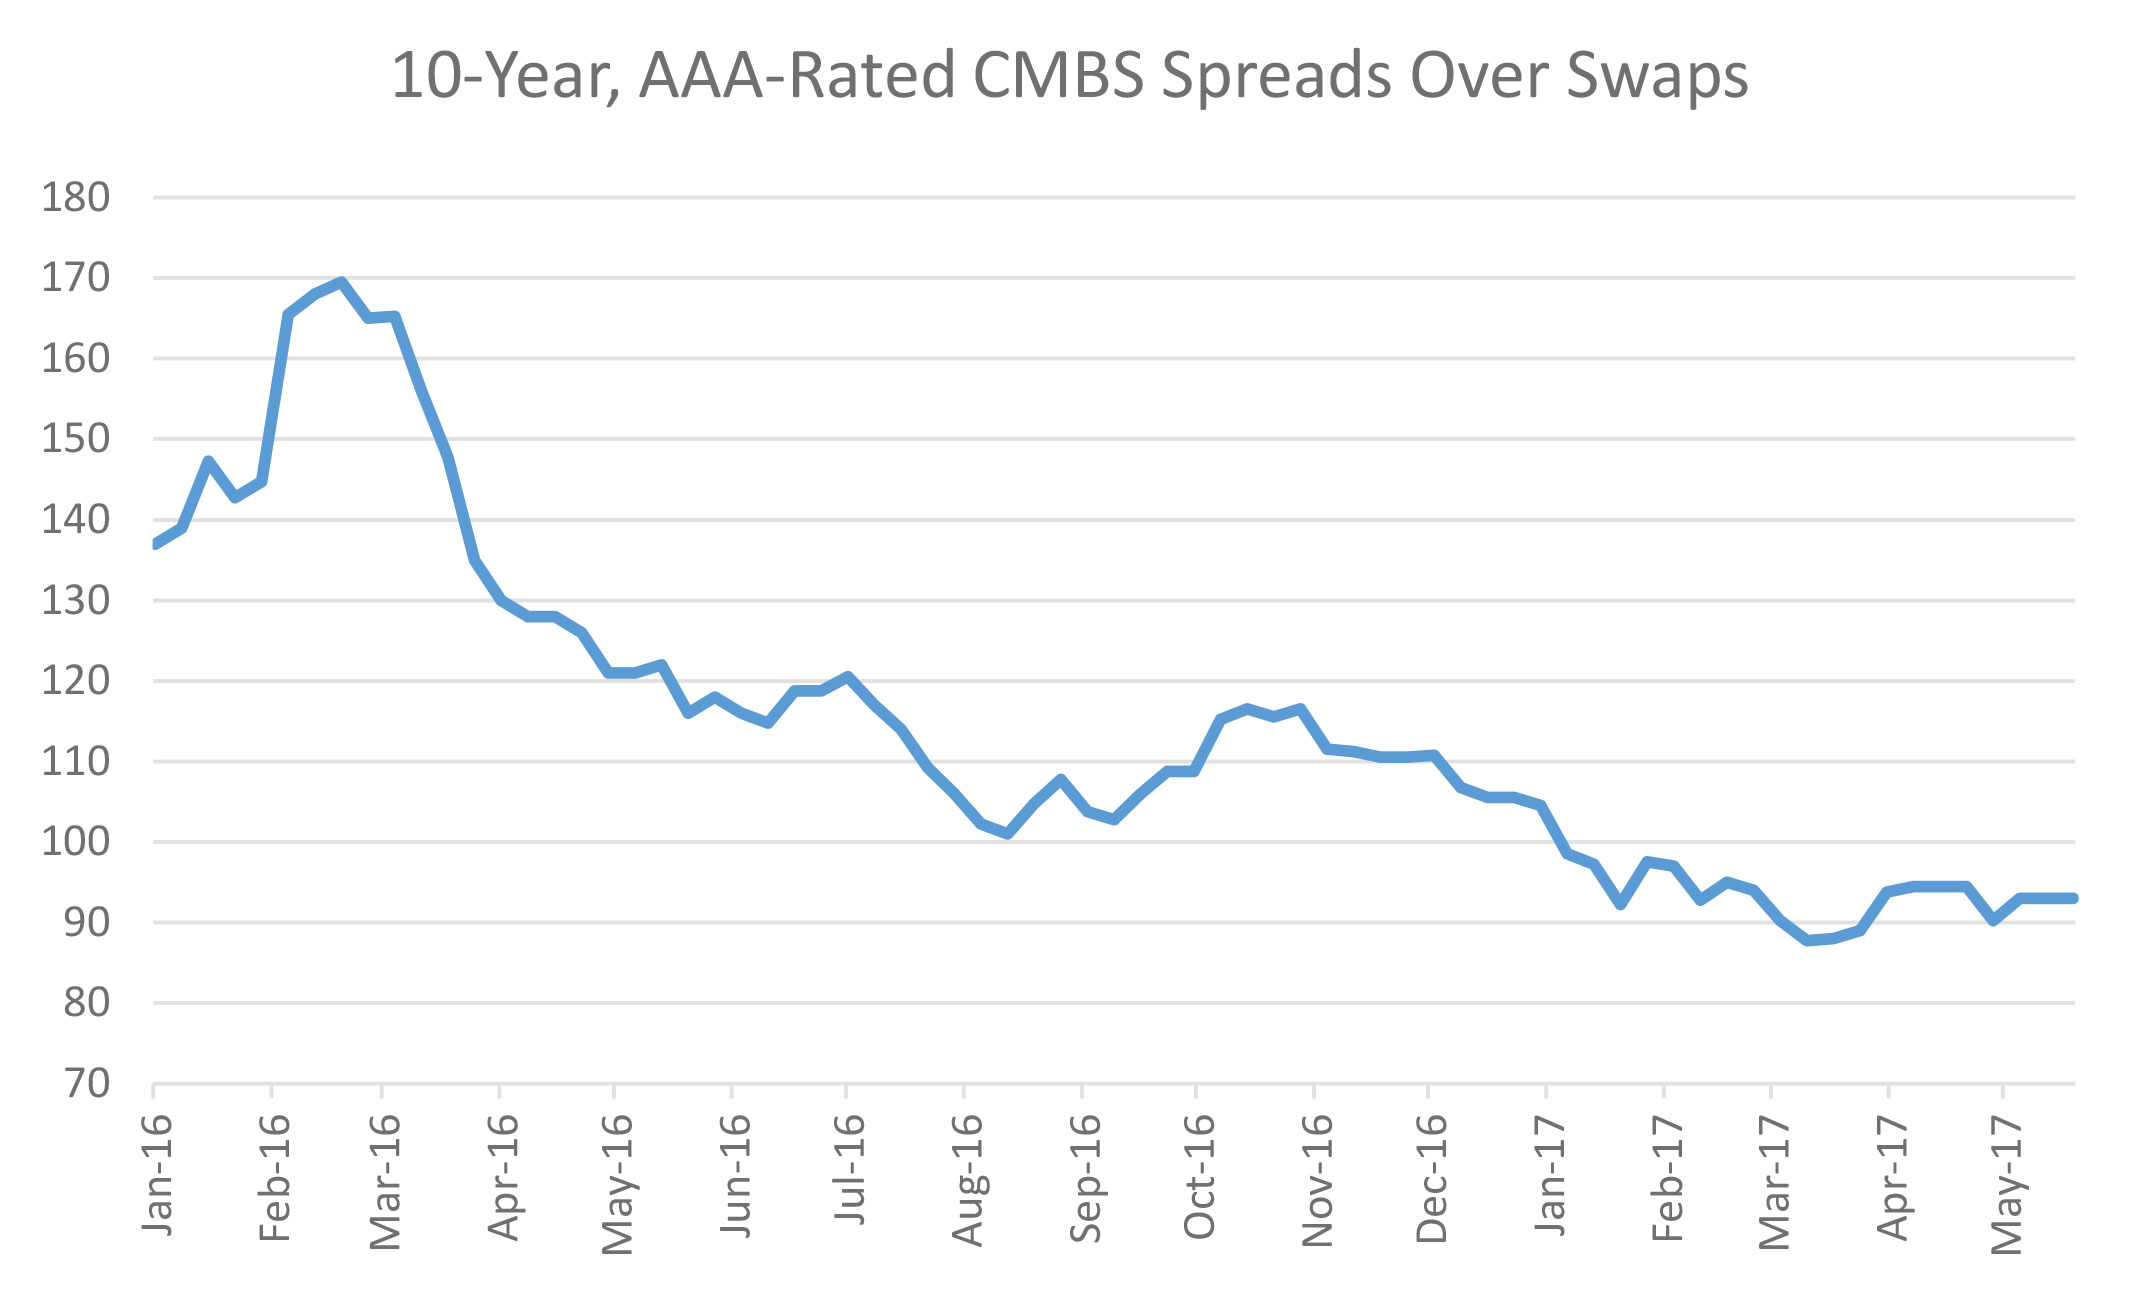 Source: Commercial Mortgage Alert